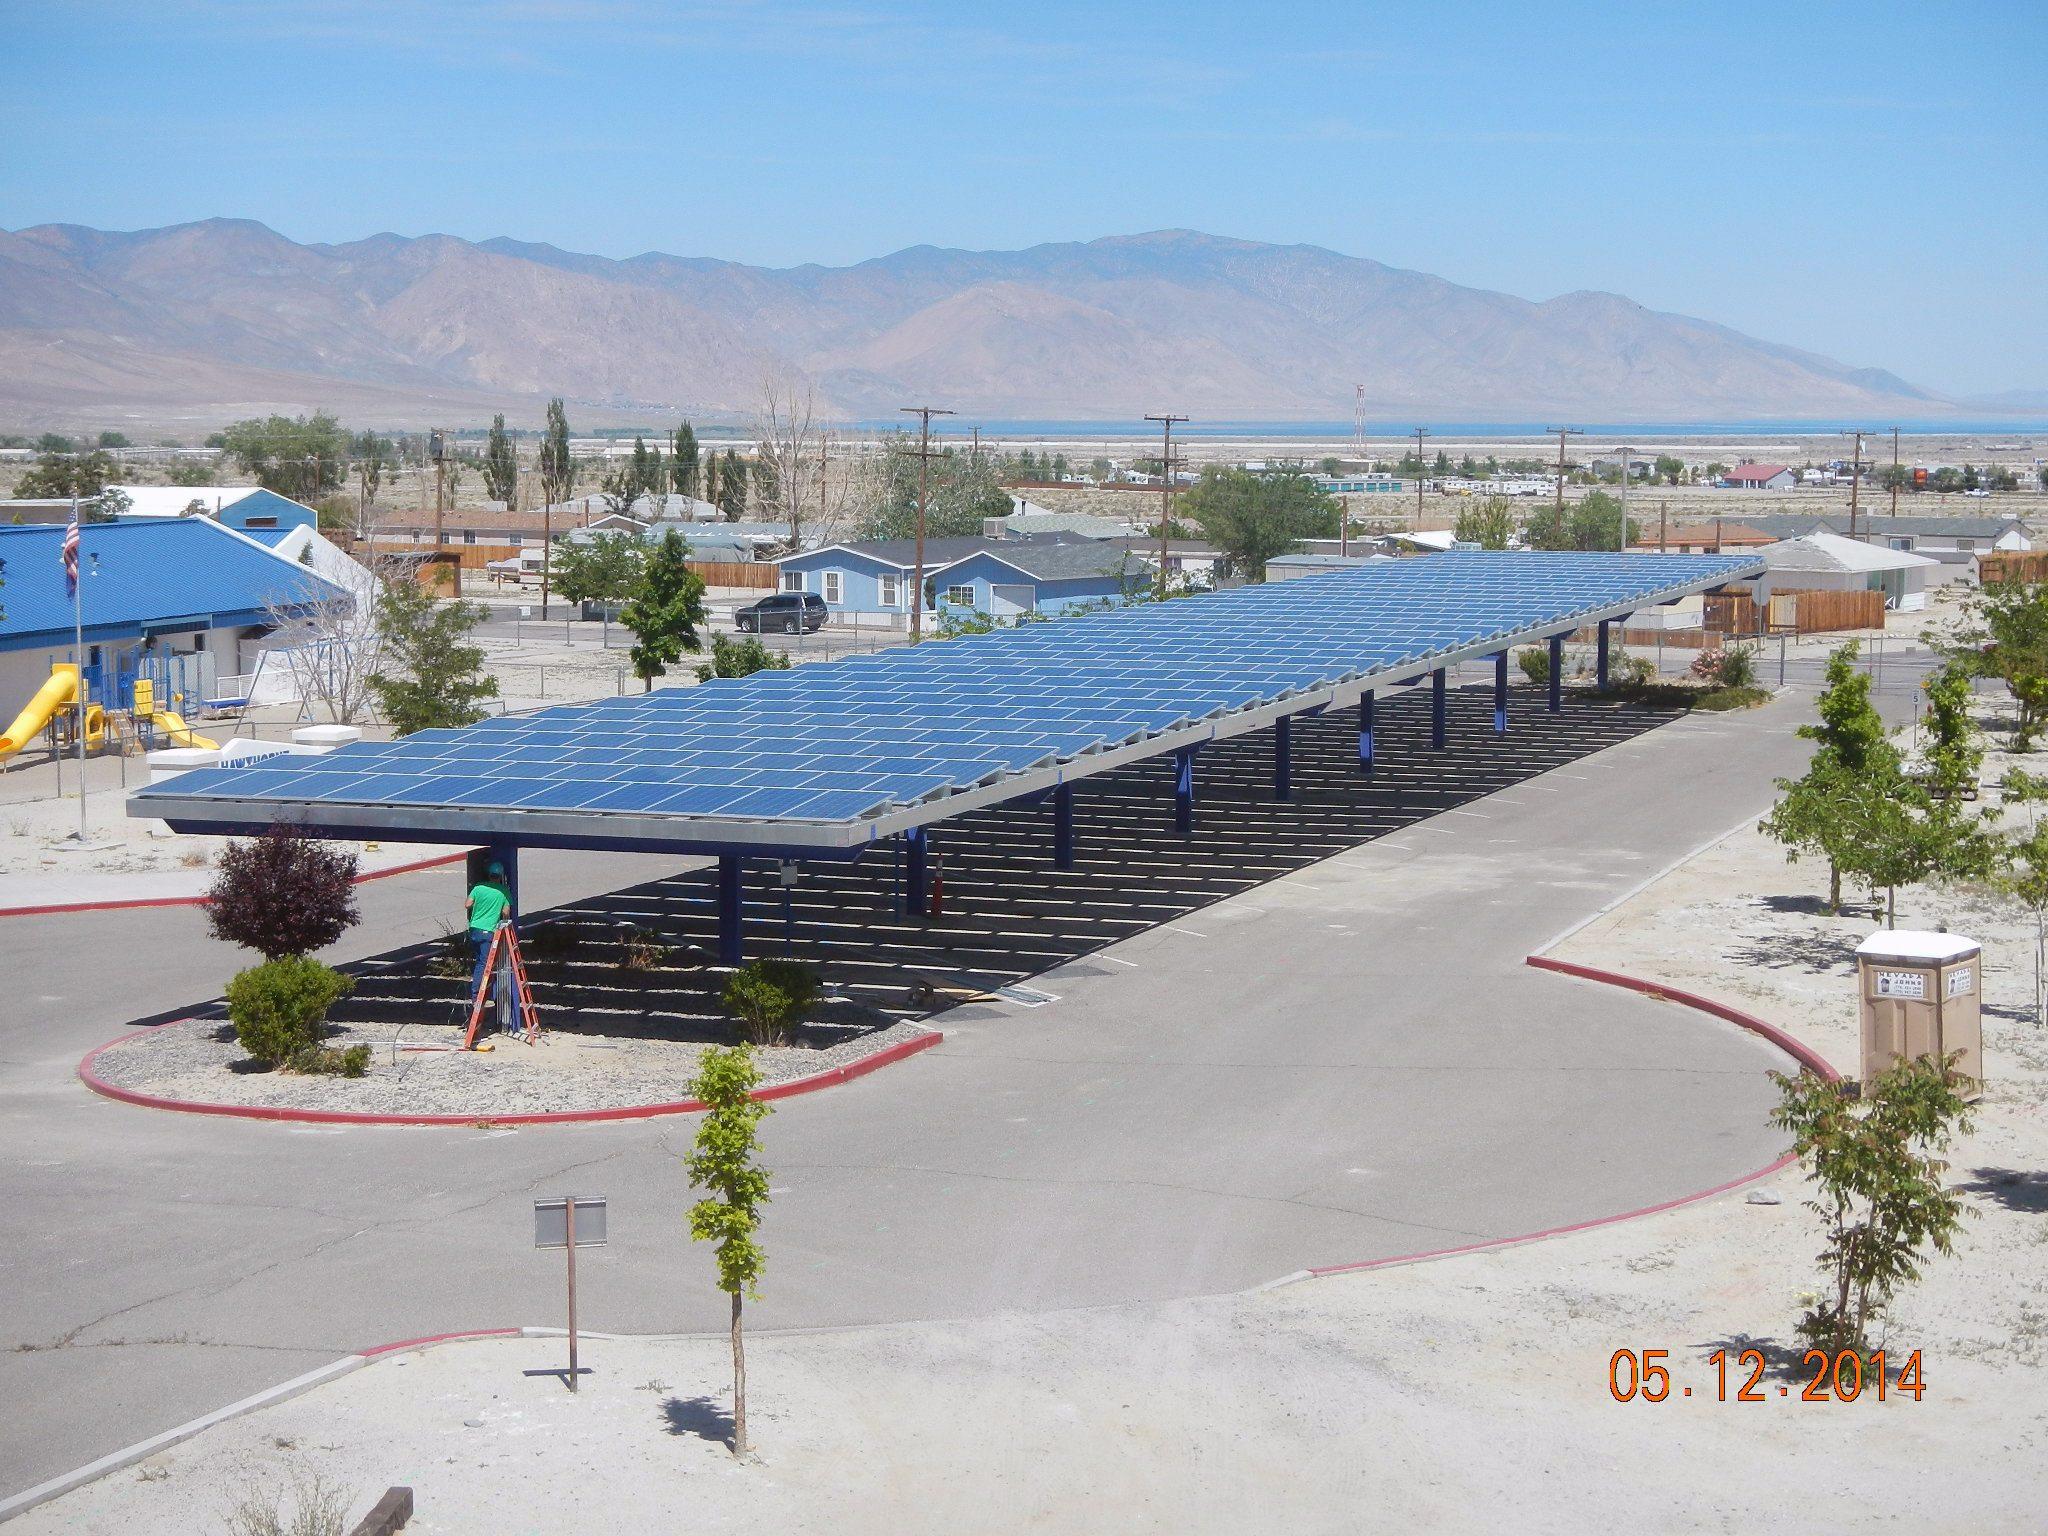 Local schools power into future with solar panel installation